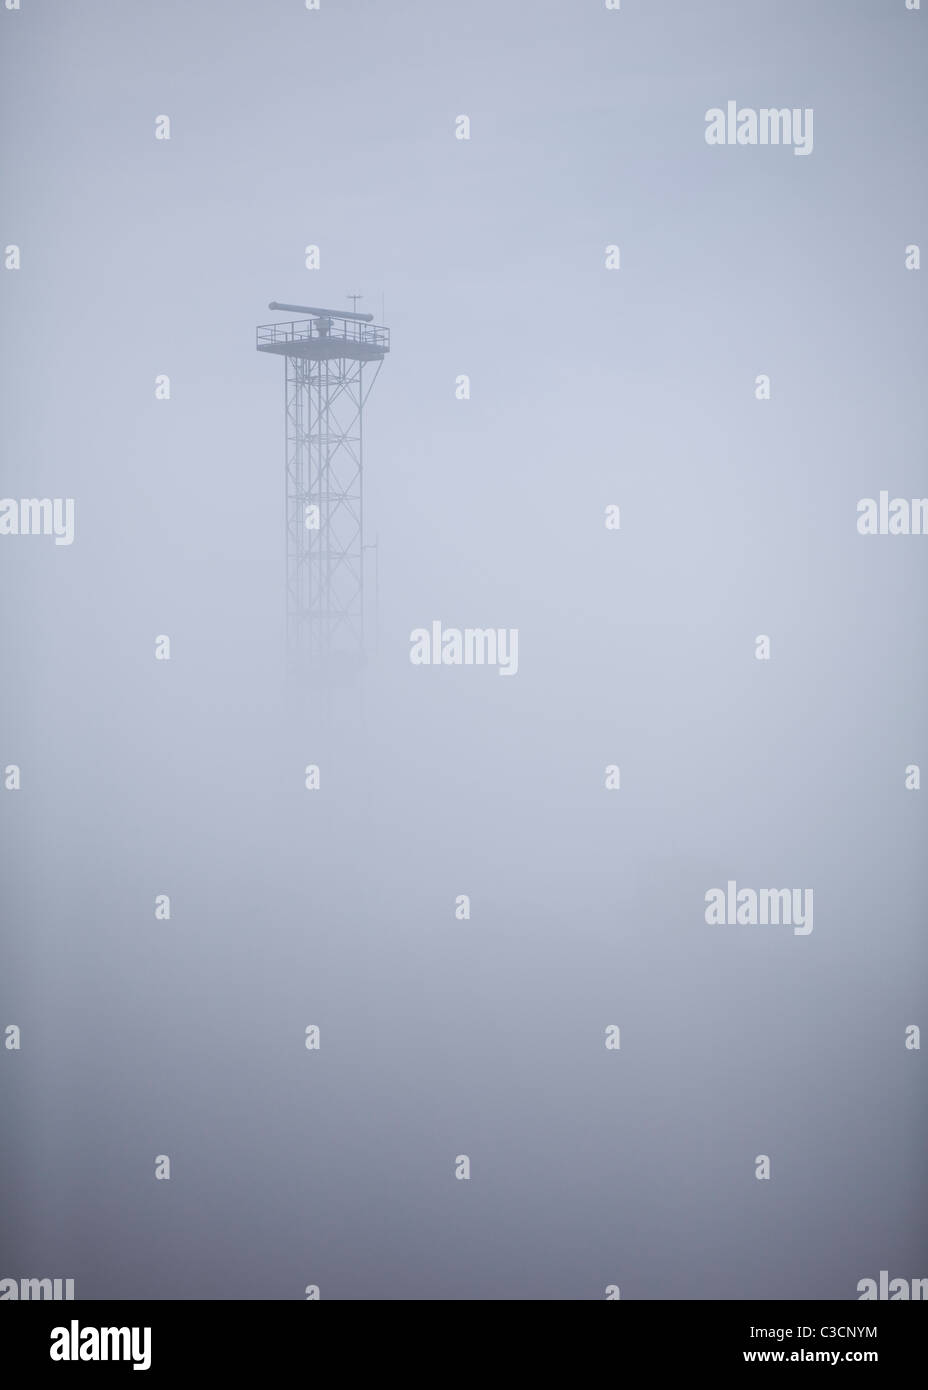 Radar antenna tower in heavy fog - Stock Image